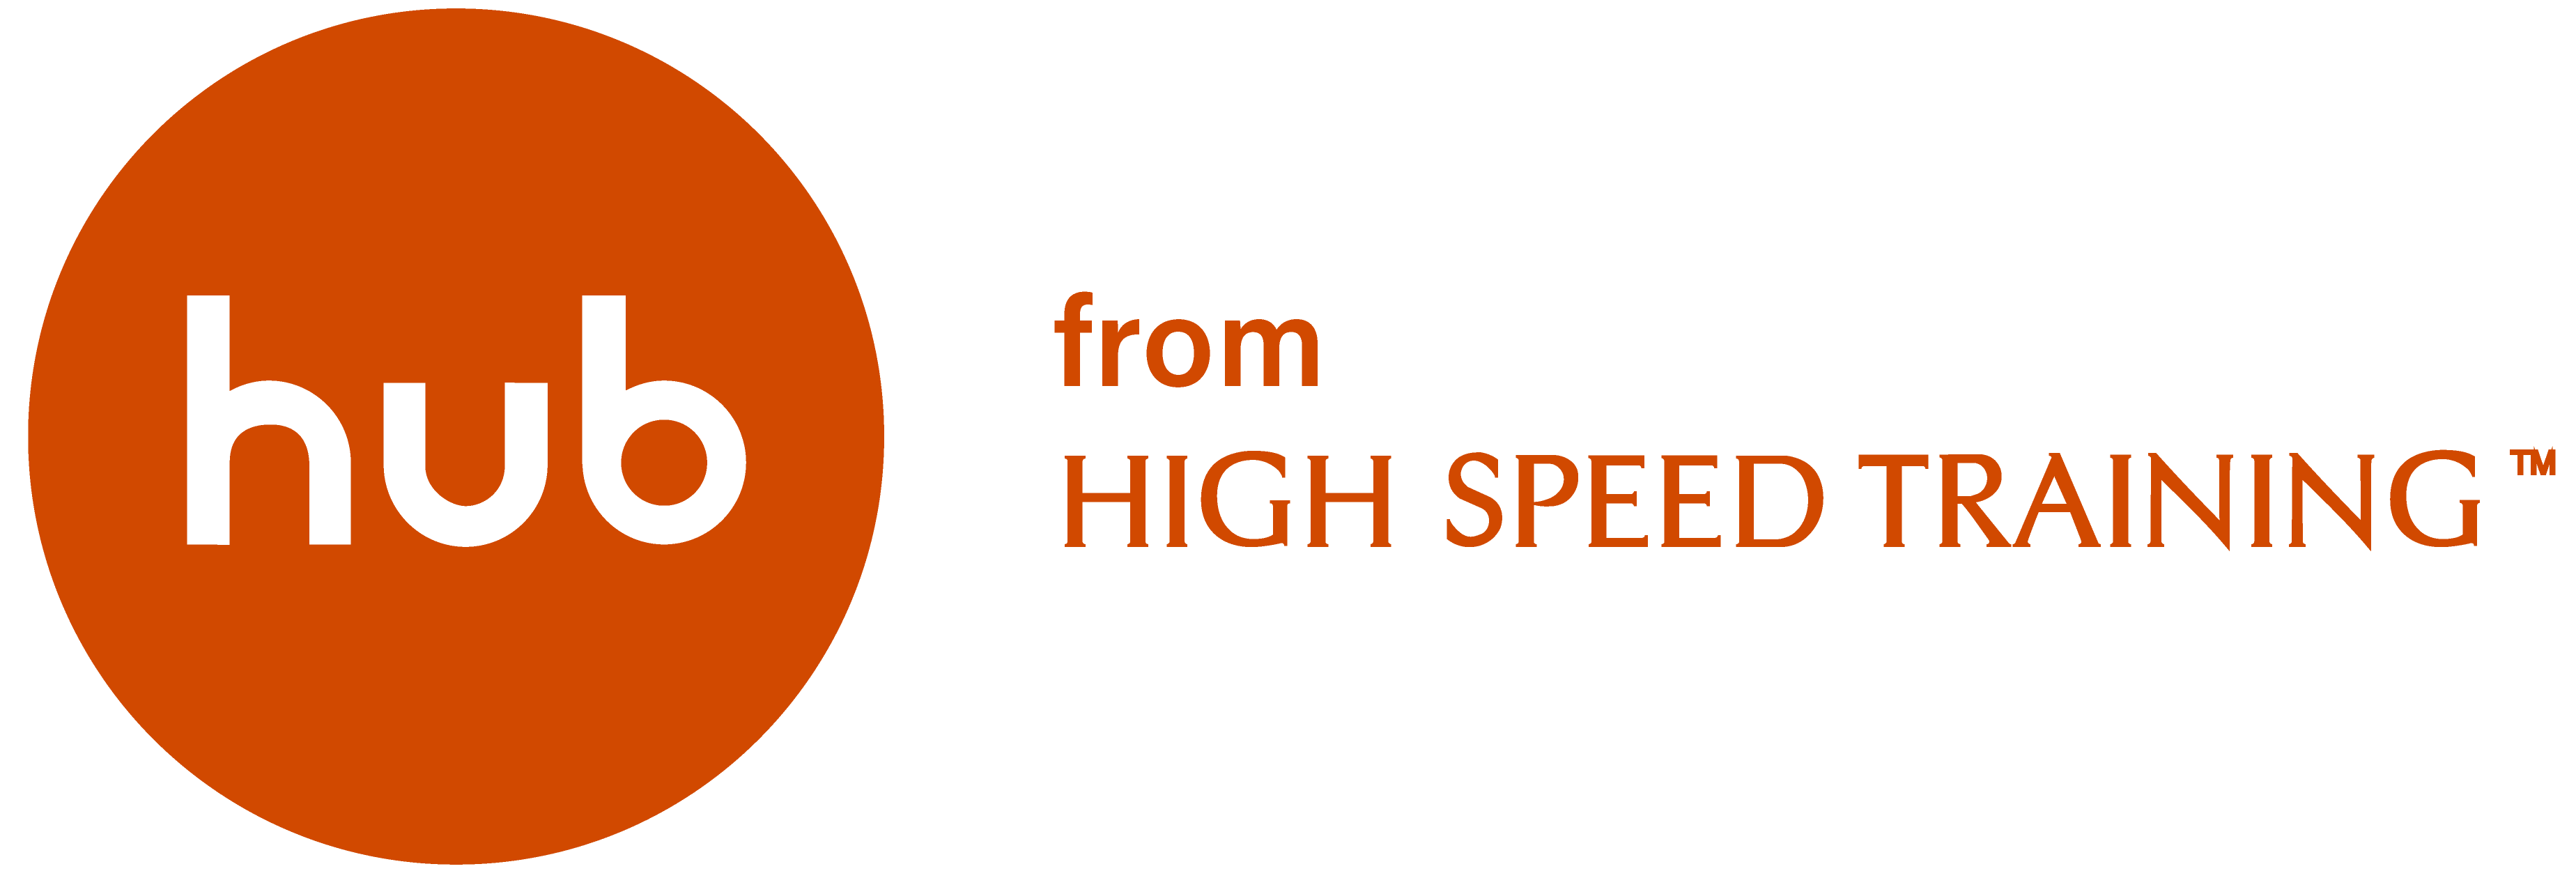 High Speed Training Hub Logo